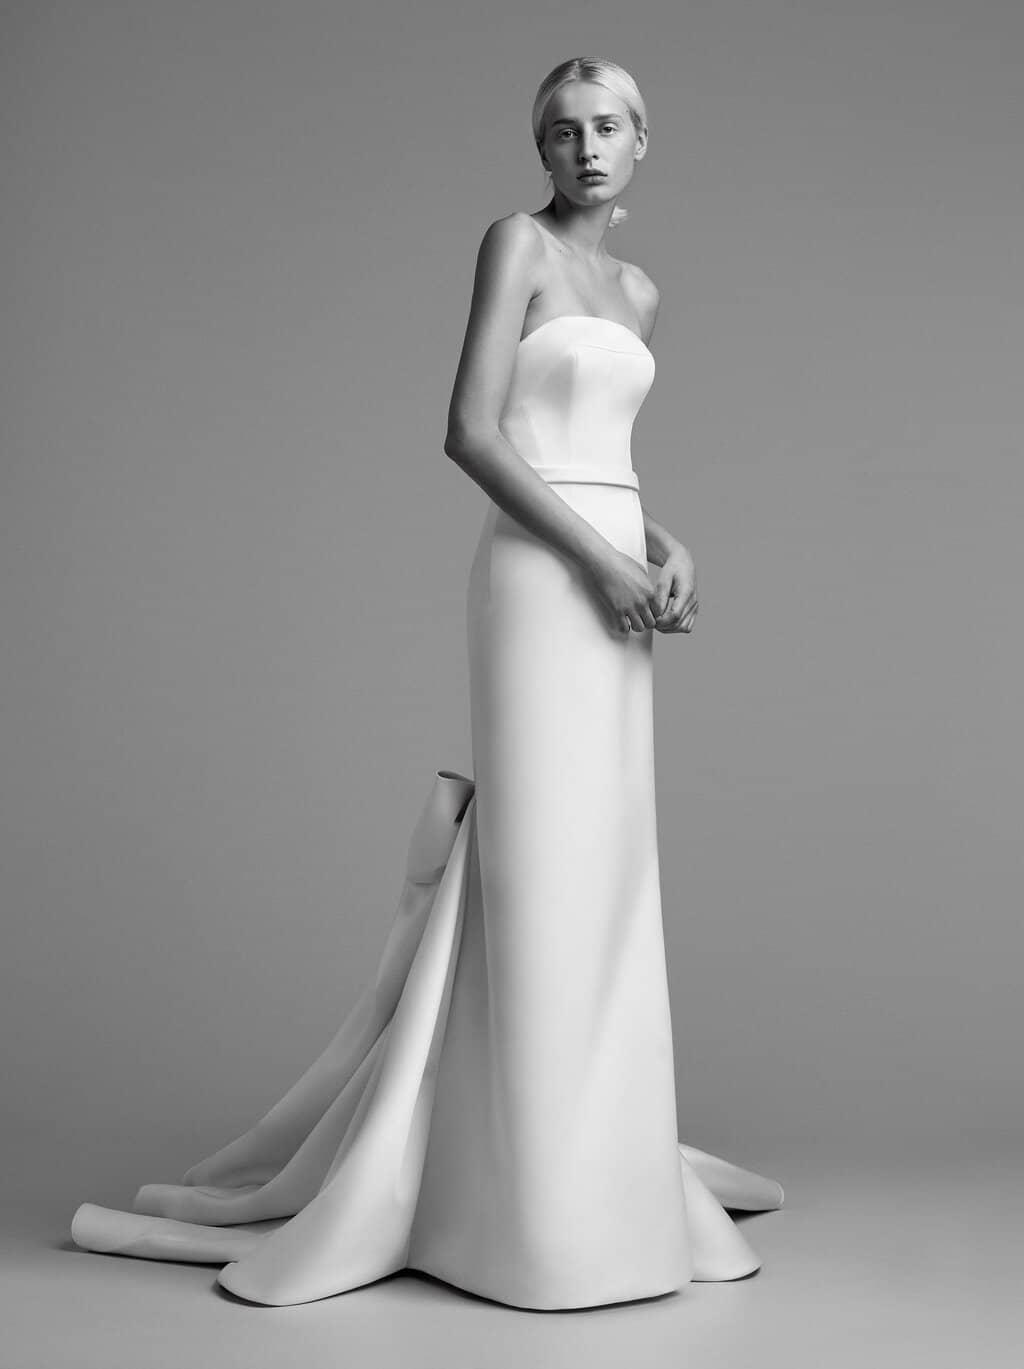 vestido-de-noiva-sem-renda-VR_MARIAGE_by_Marijke_Aerden